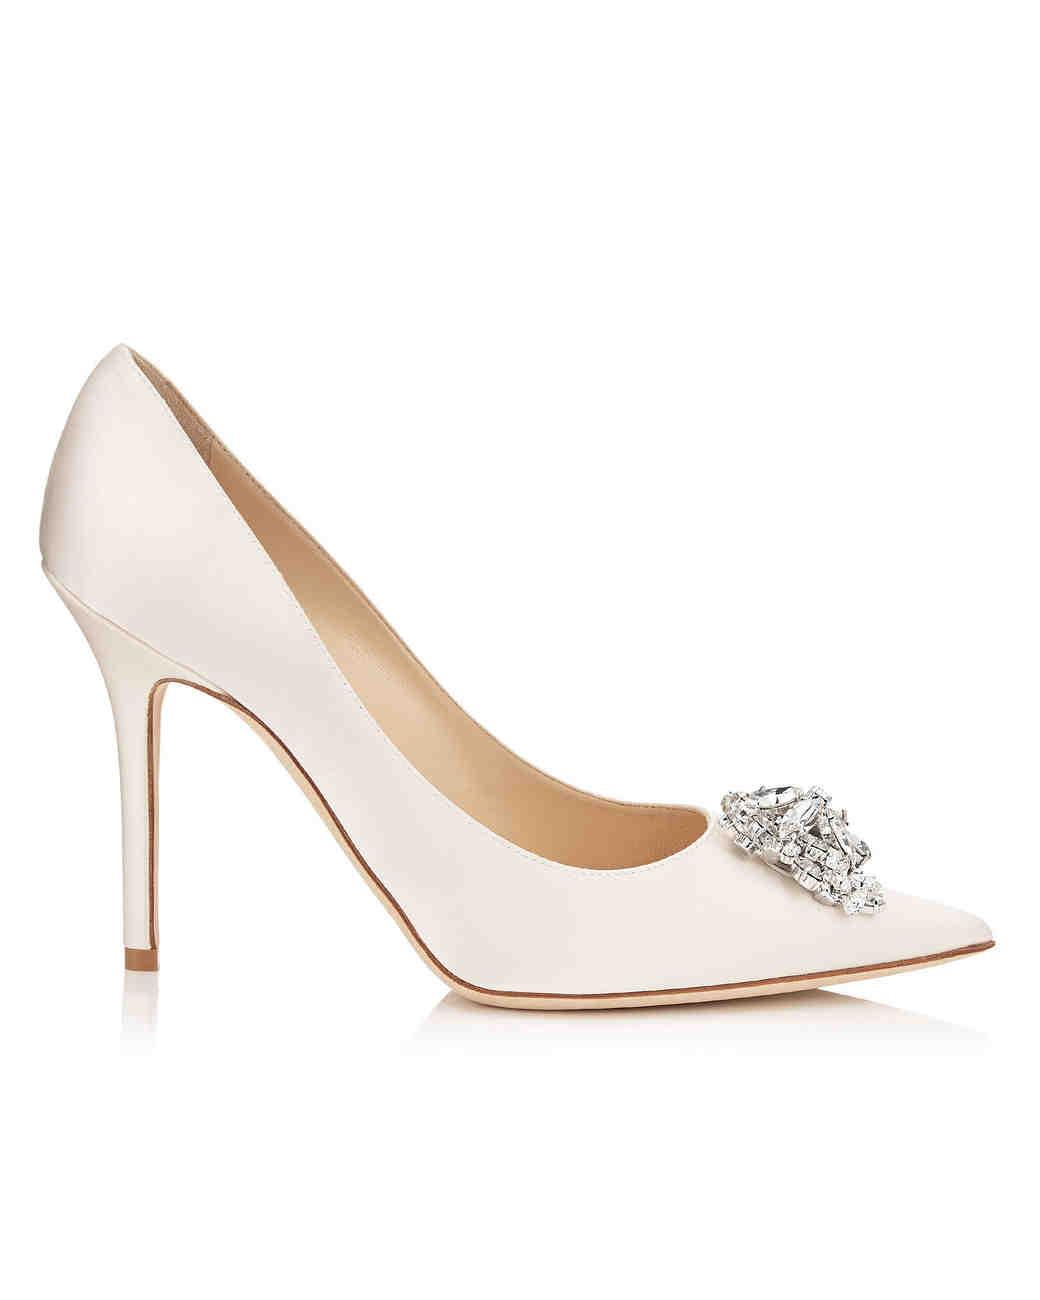 jimmy choo wedding shoes Bridal shoe Jimmy choo cinderella bridal shoes